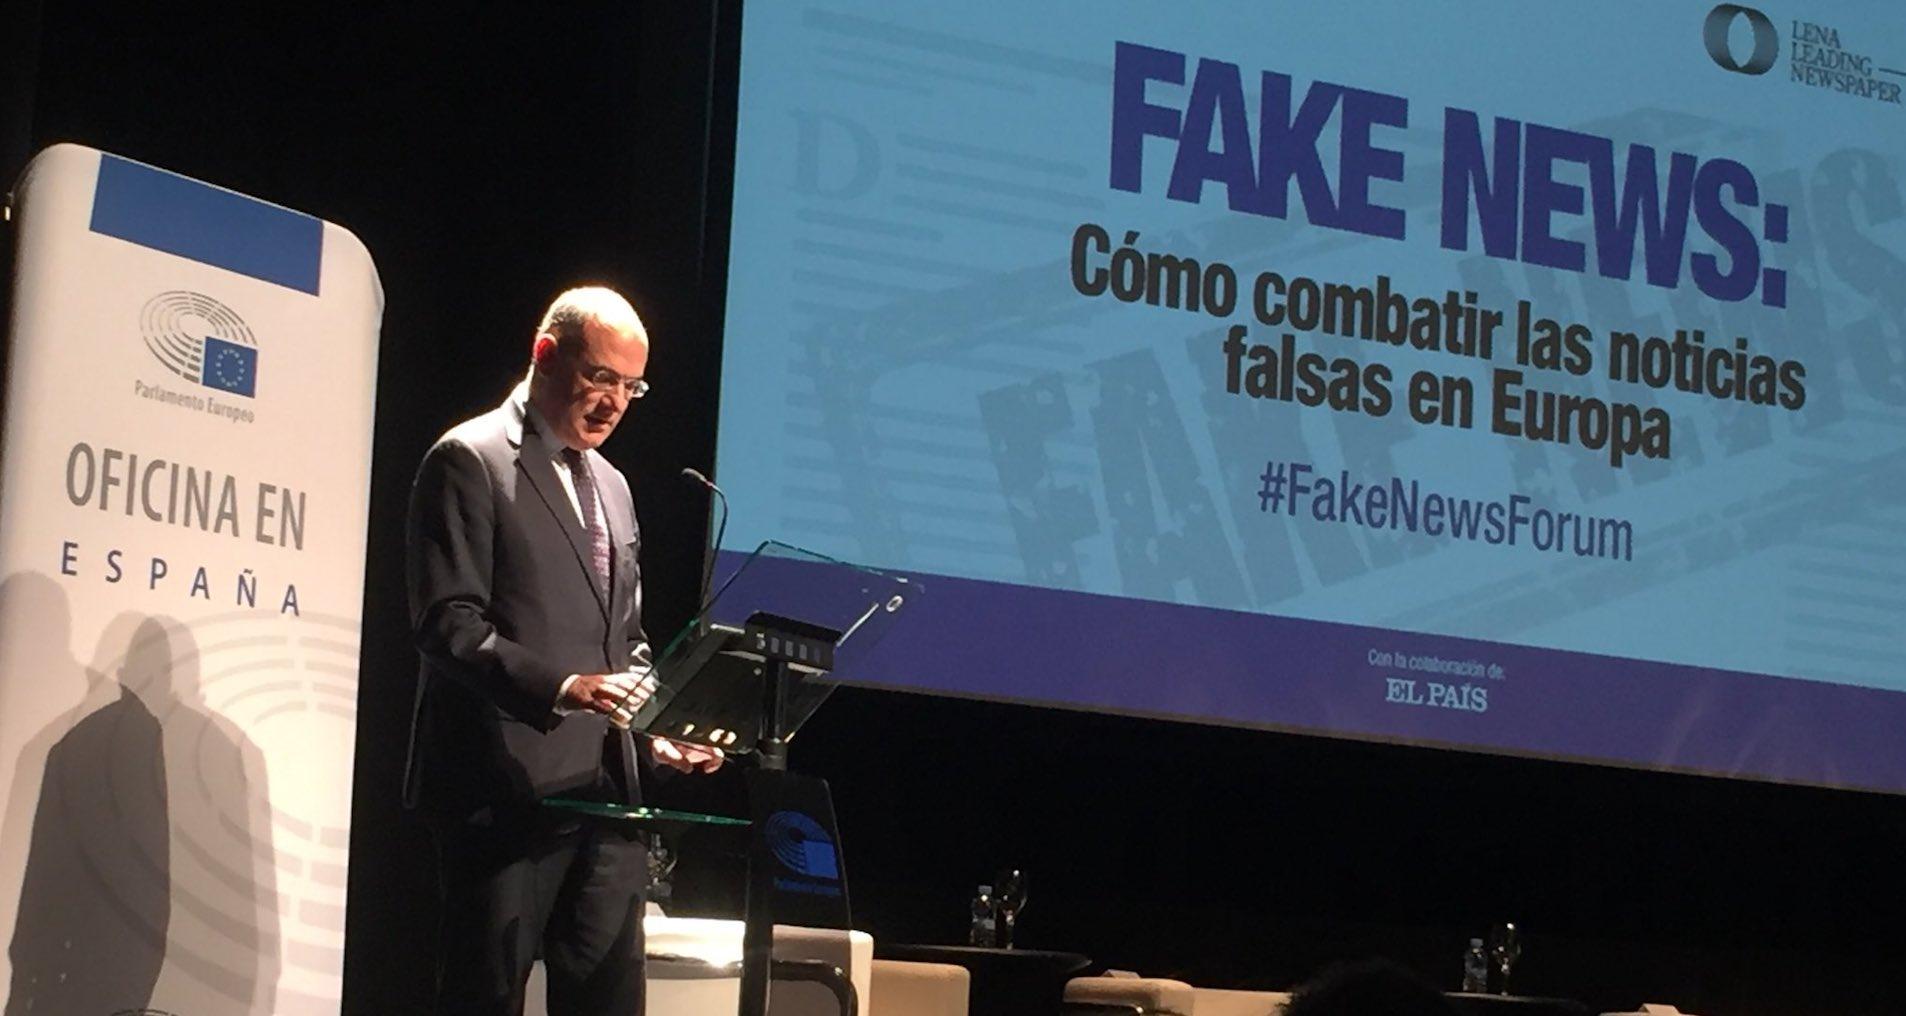 foro fake news